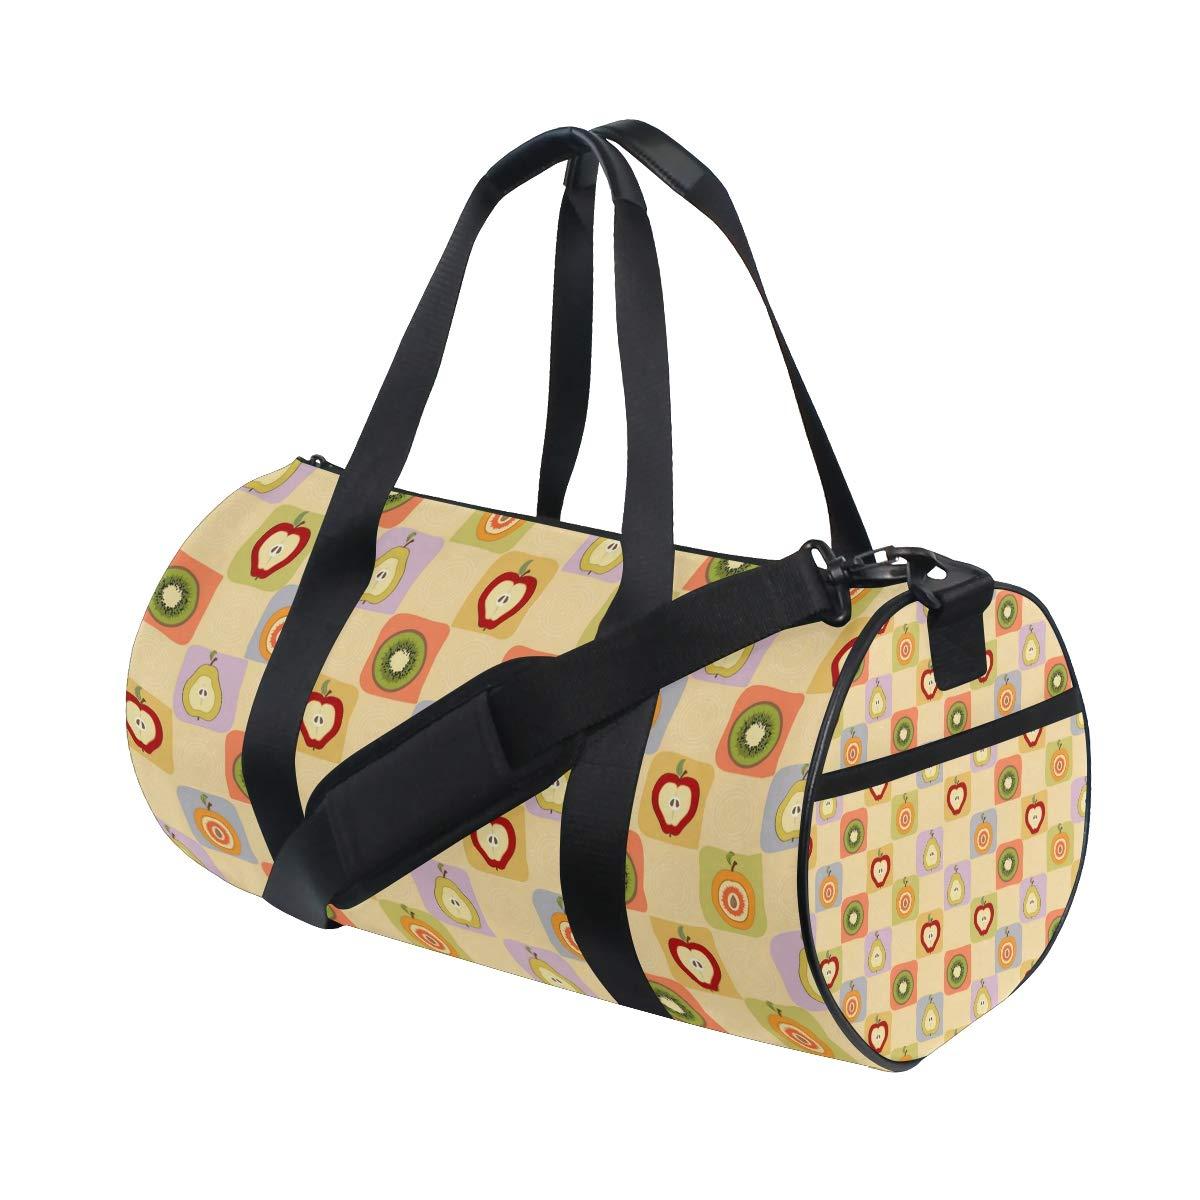 Waterproof Non-Slip Wearable Crossbody Bag fitness bag Shoulder Bag Lattice Fruit Picture